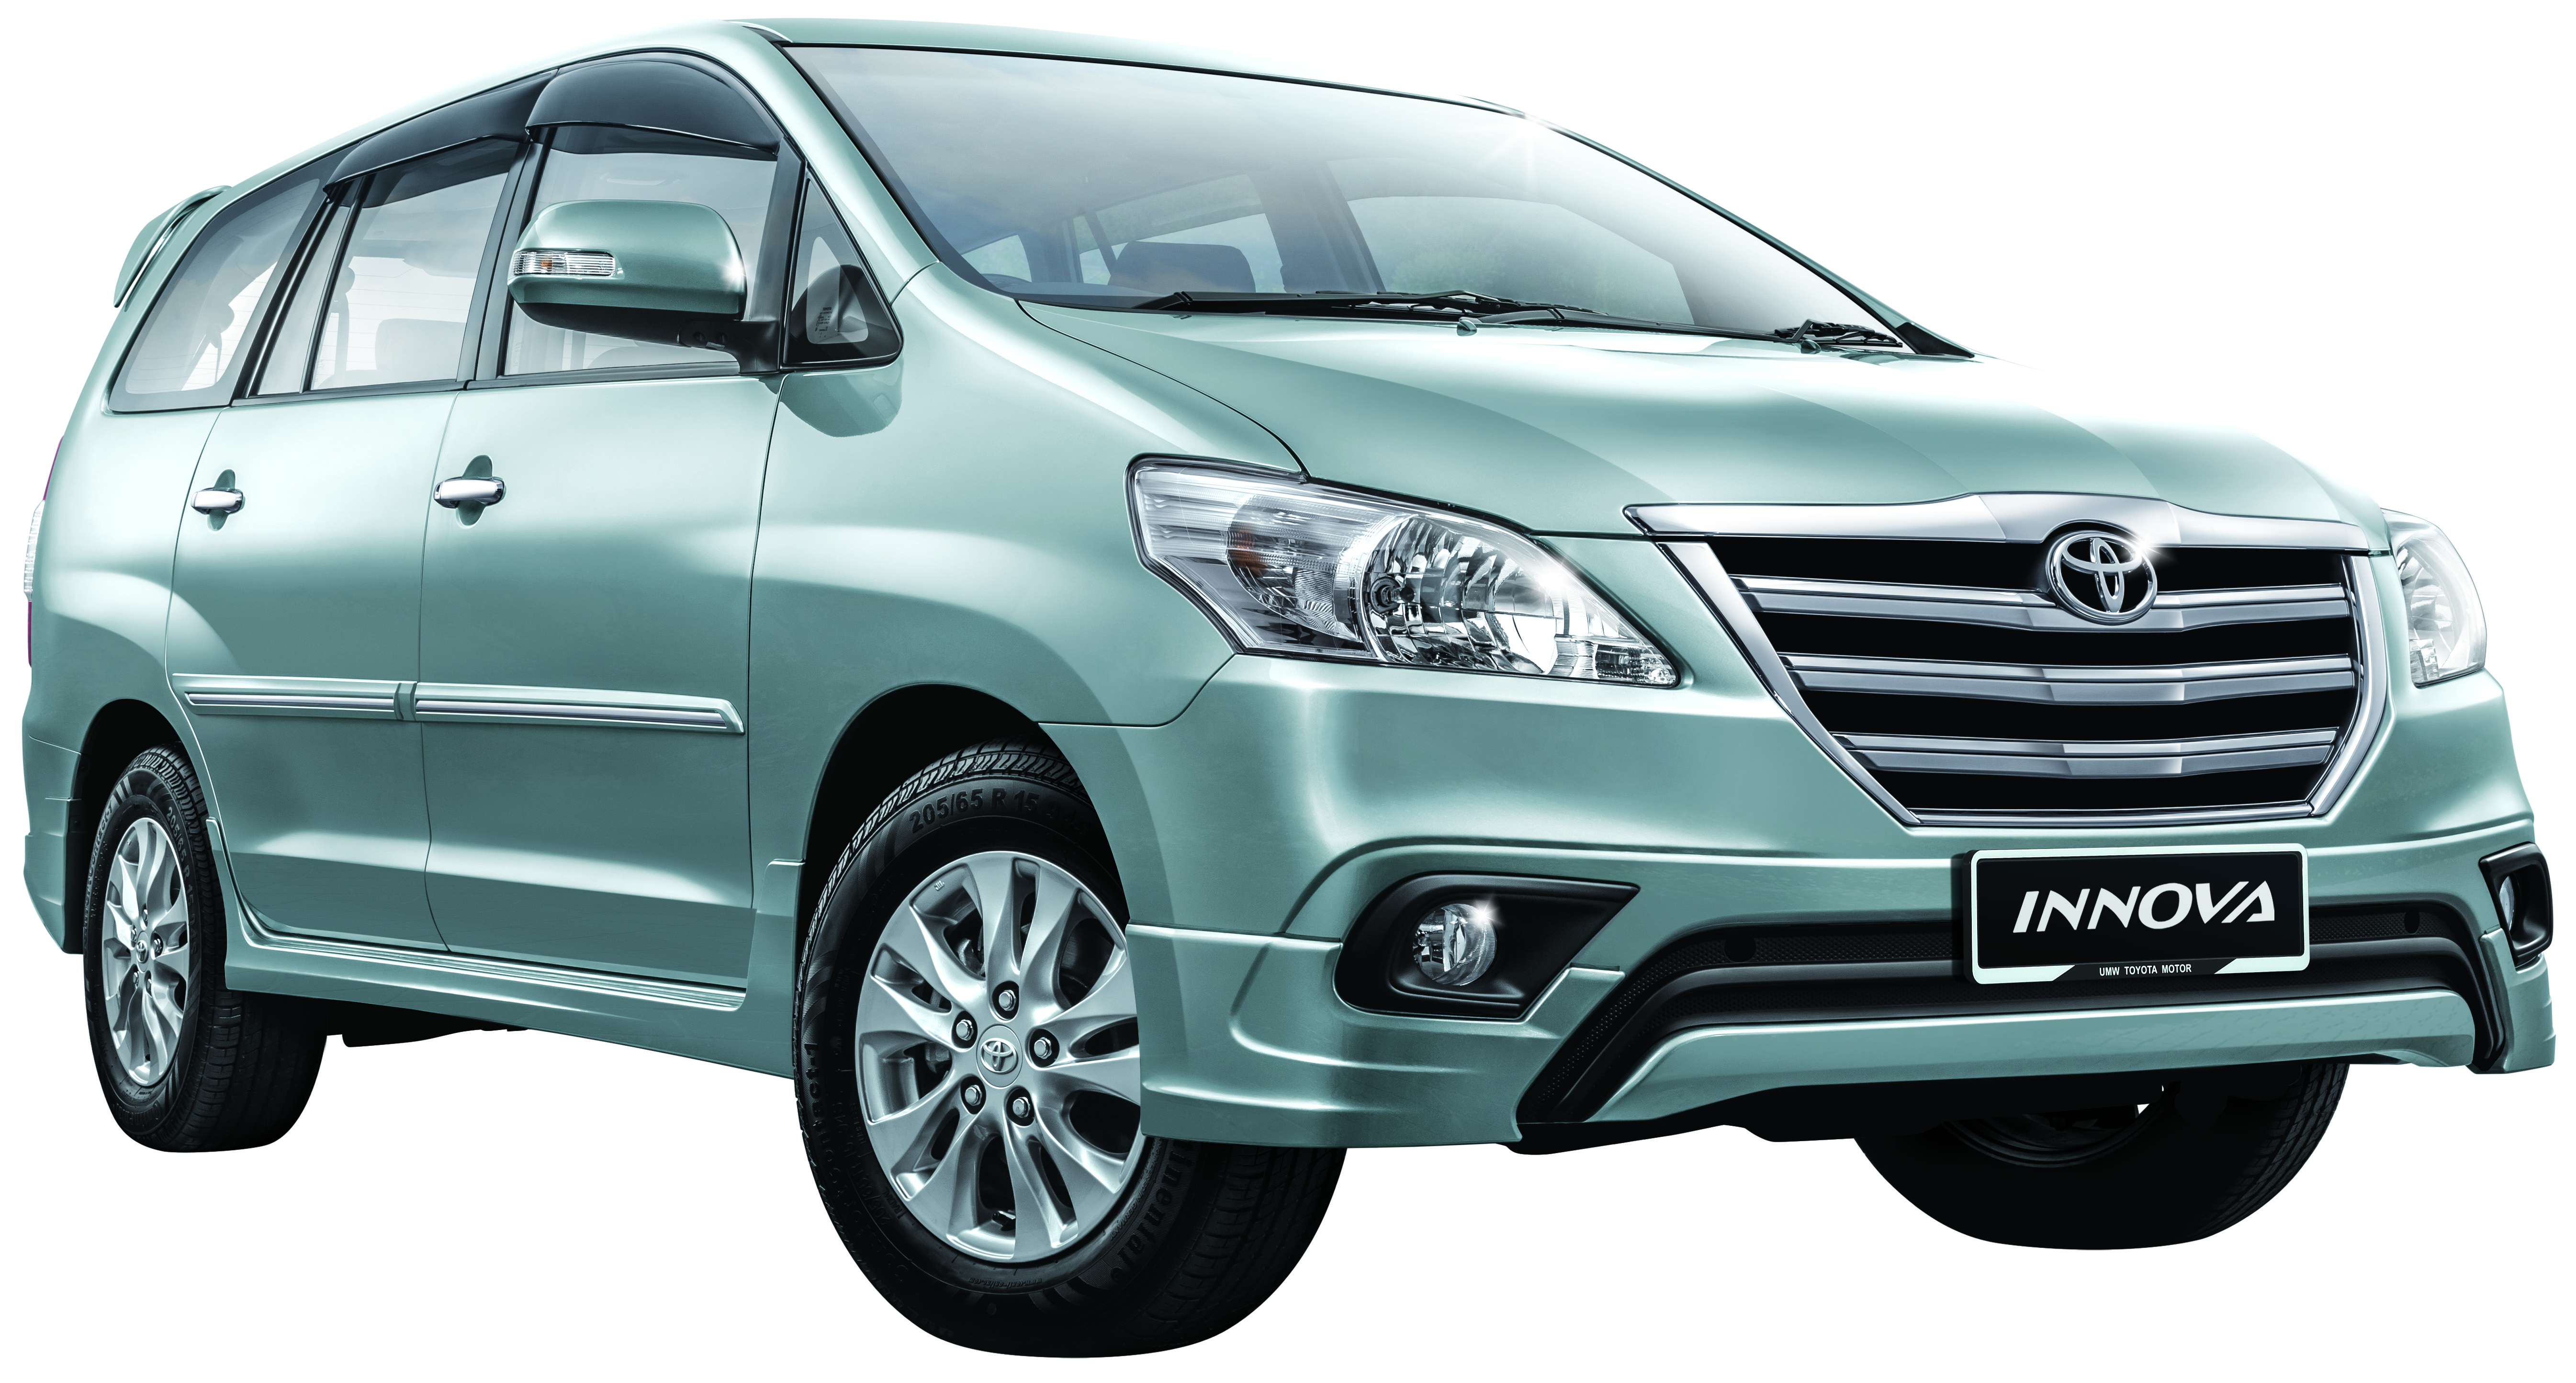 Toyota Innova Mpv To Add To Brown Teks1m Fleet No Longer